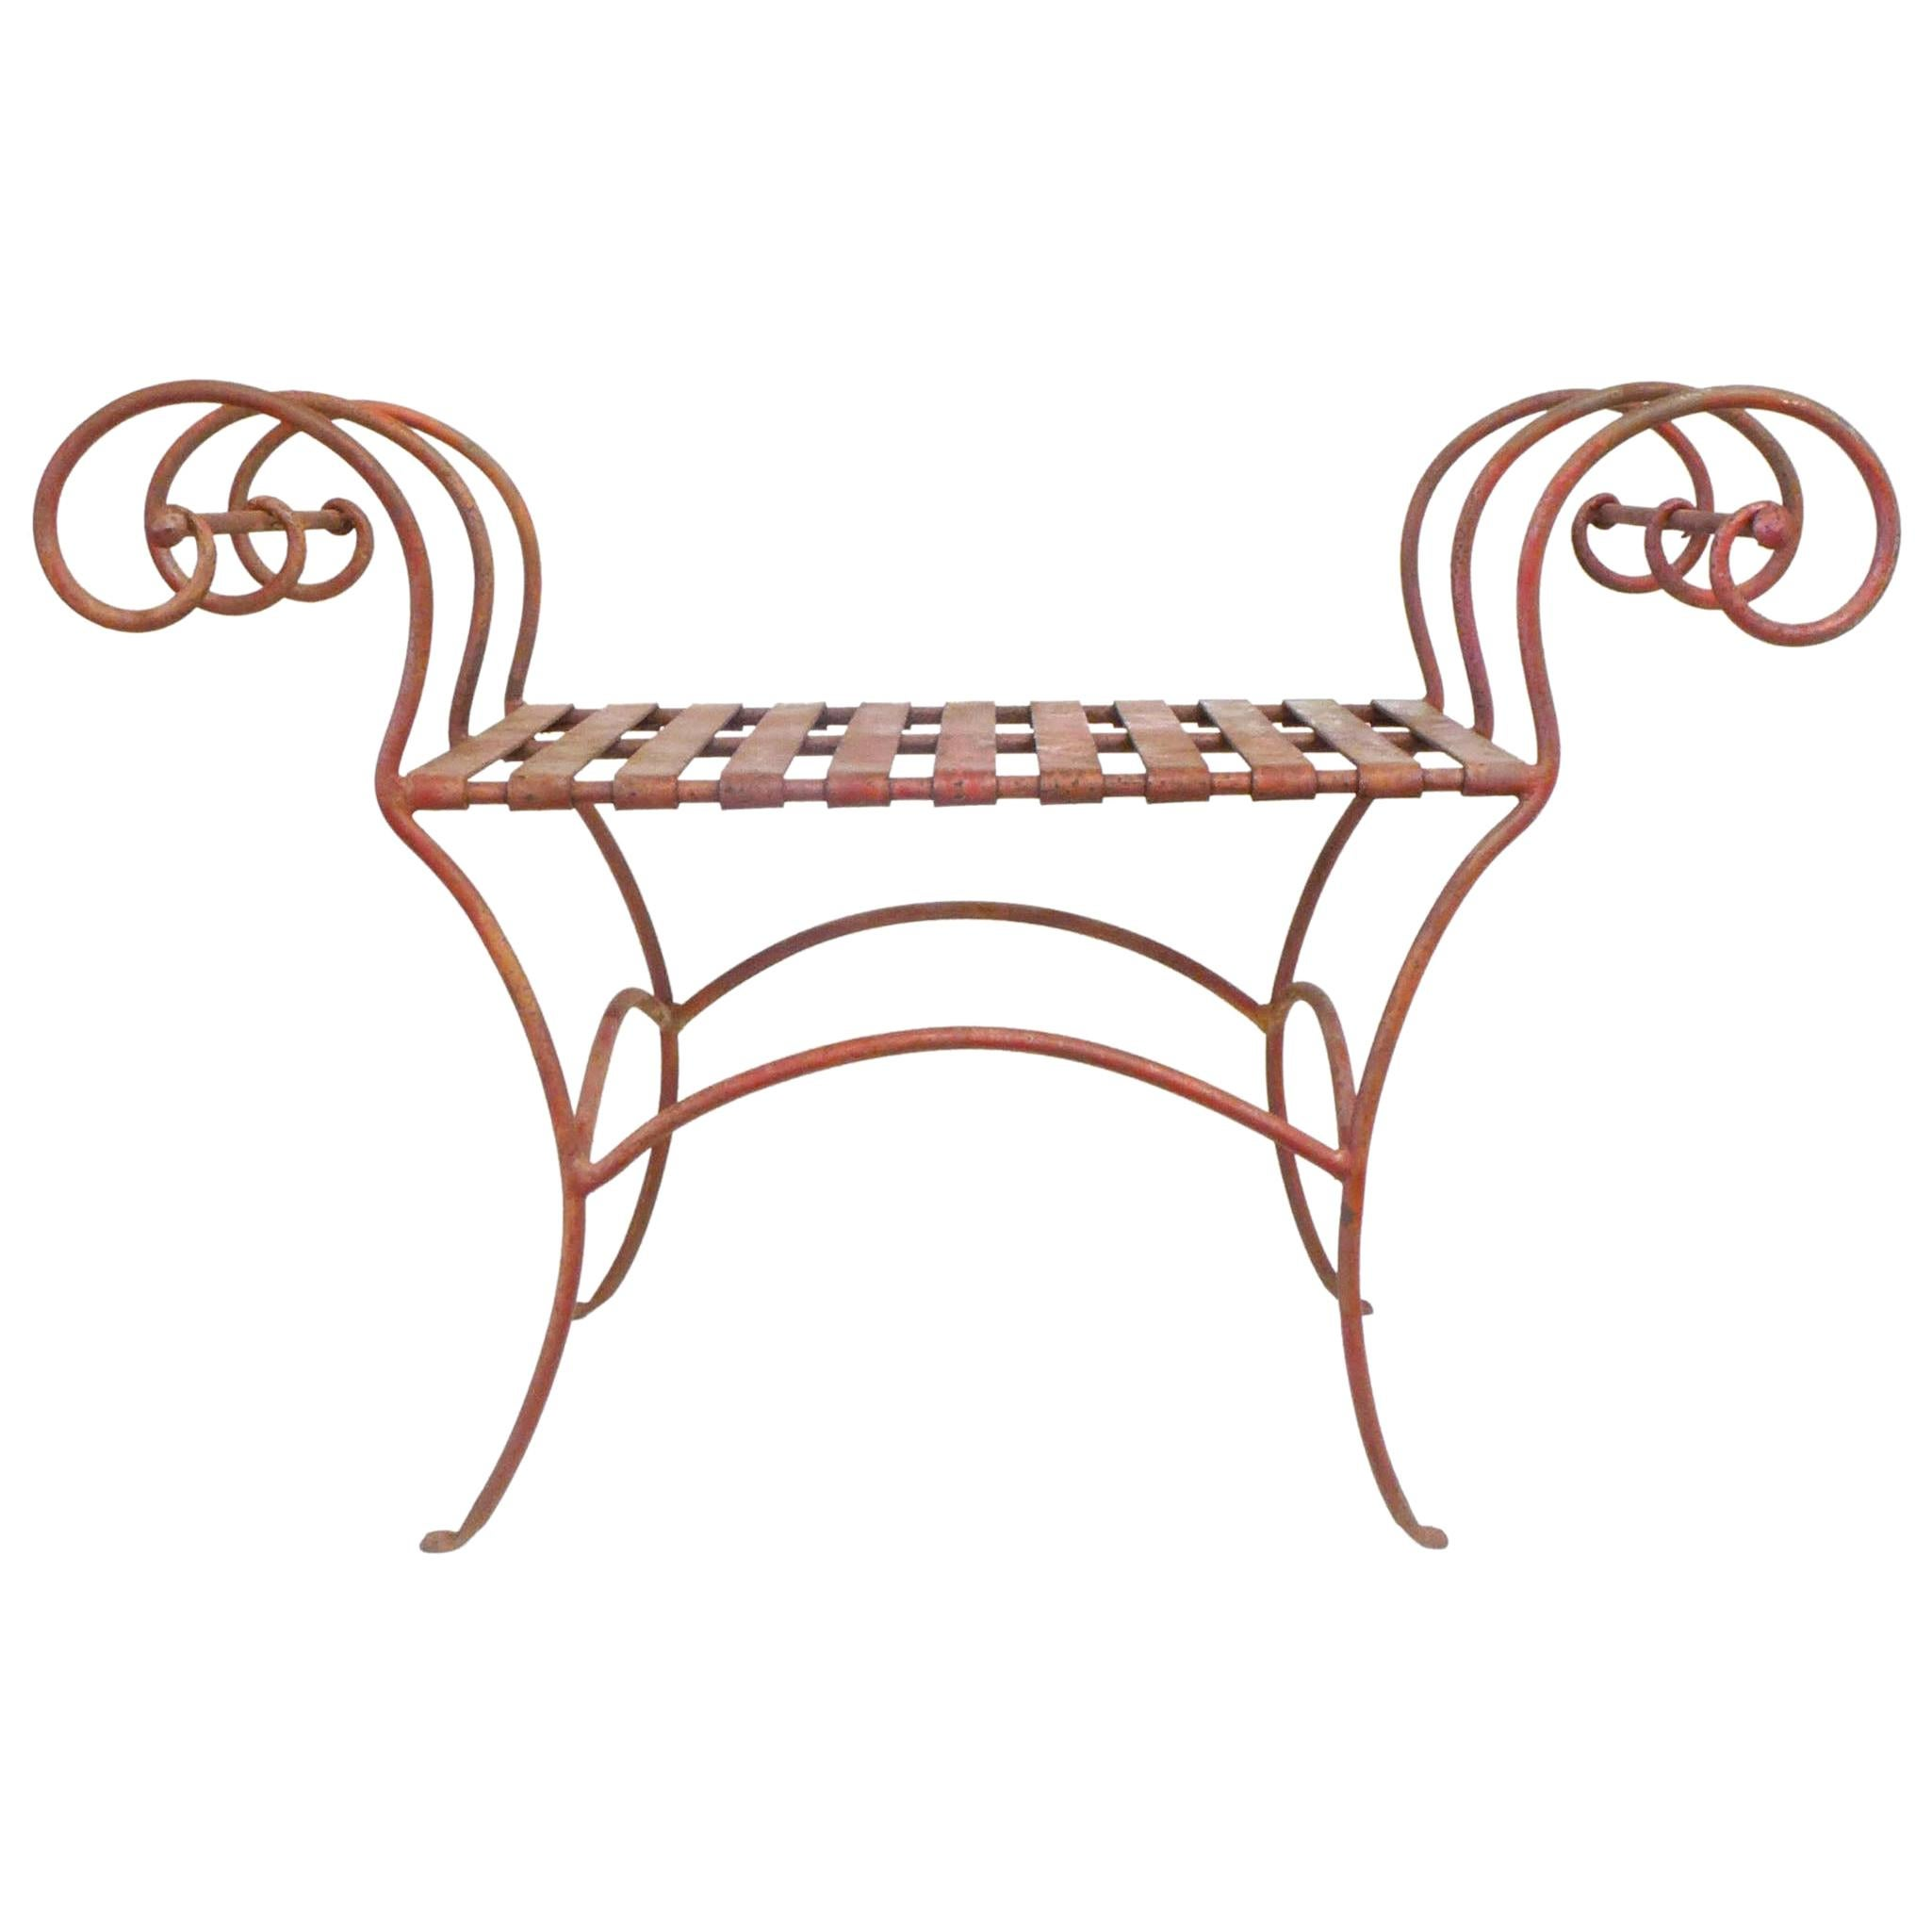 Sculptural Wrought Iron Bench